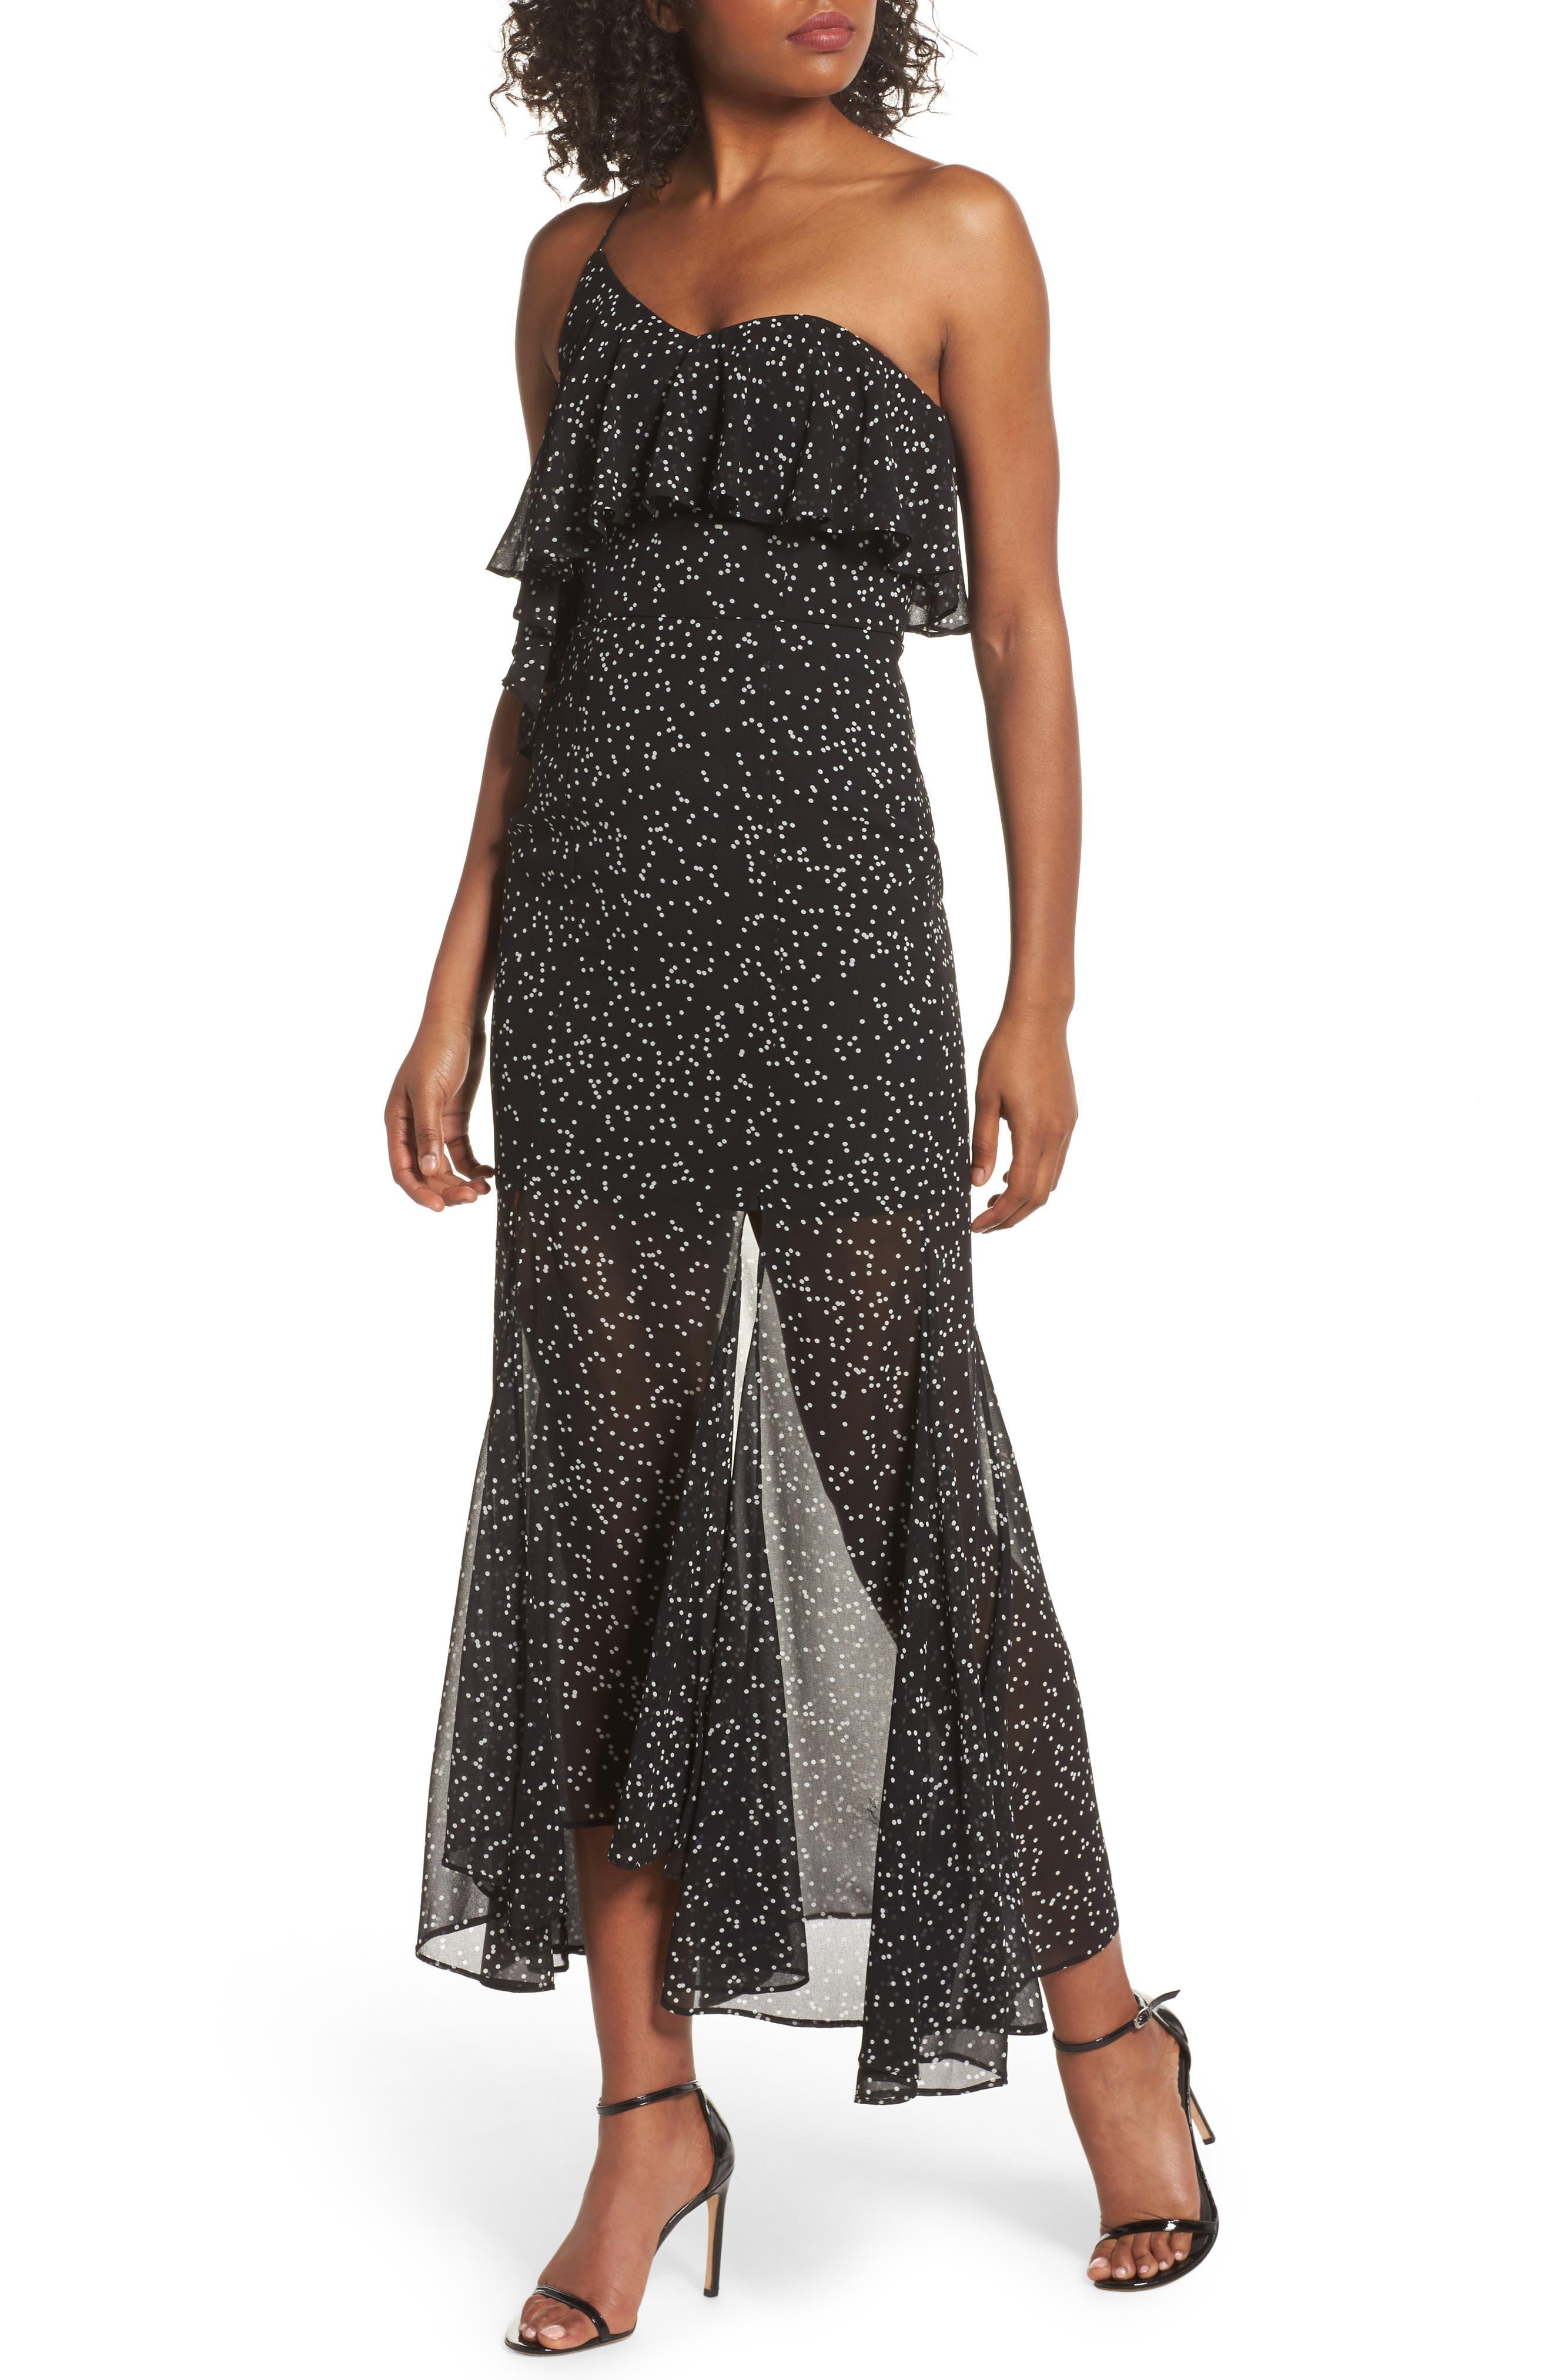 Embrace One Shoulder Dress,                         Main,                         color, Black W White Spot